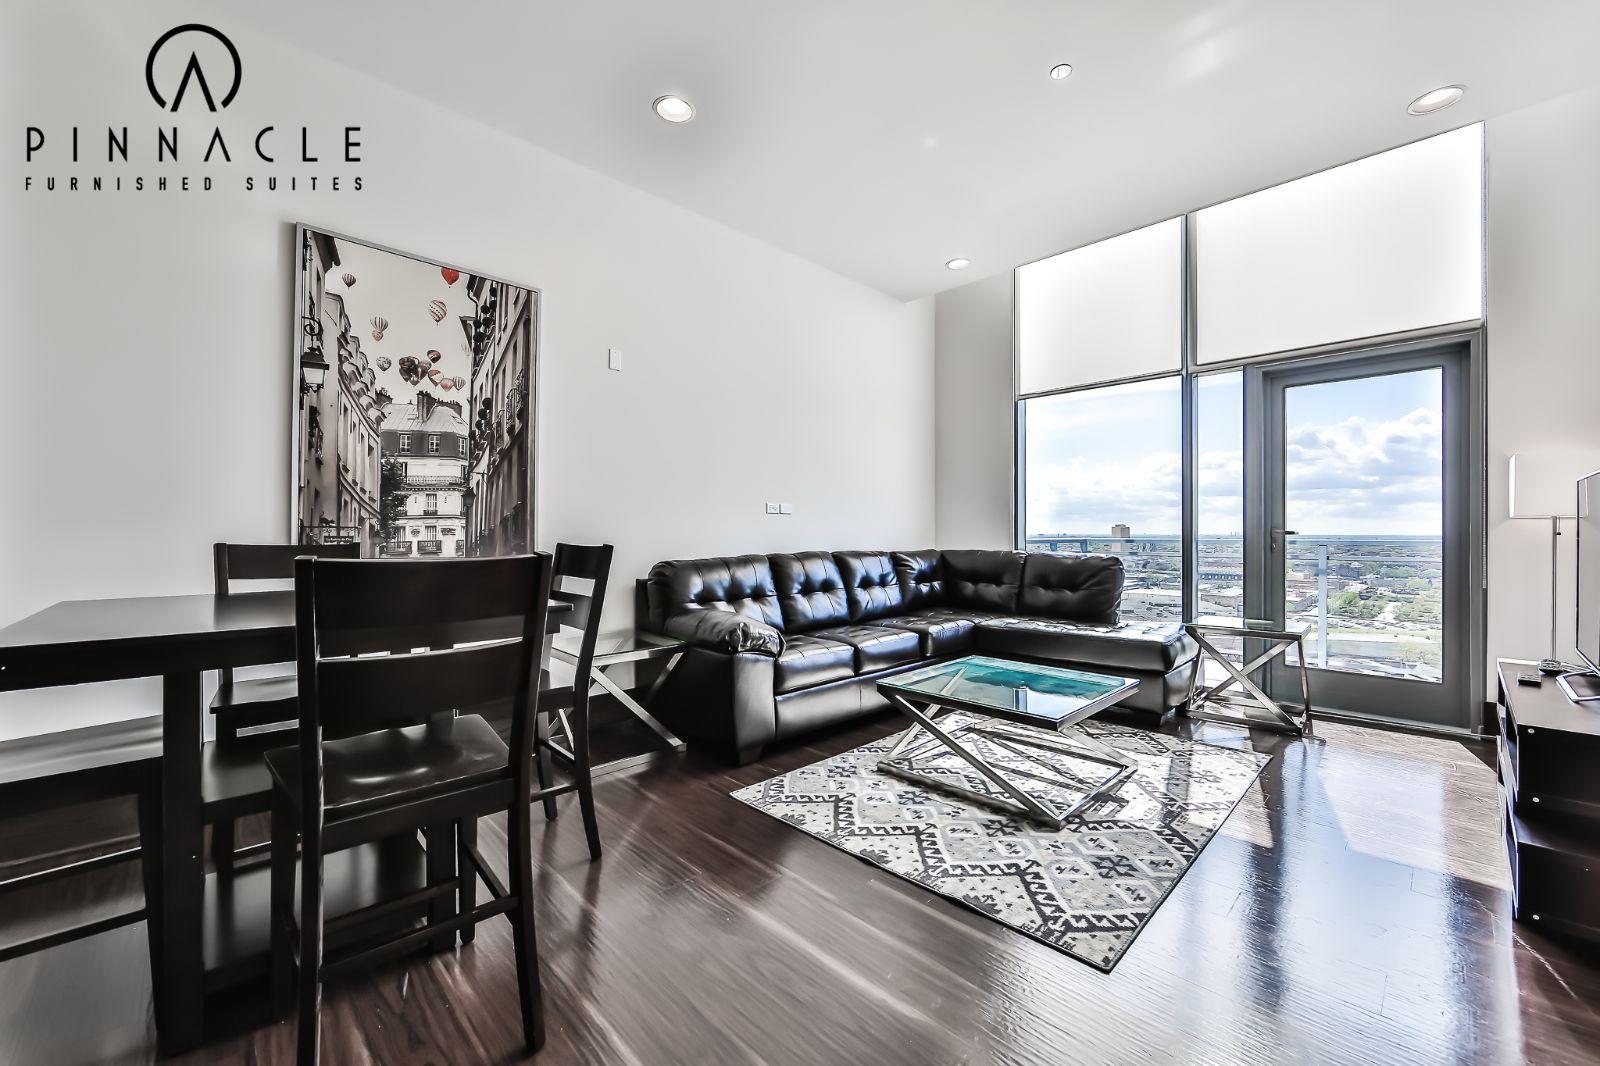 New City 1 Bedroom 11 - Pinnacle Furnished Suites